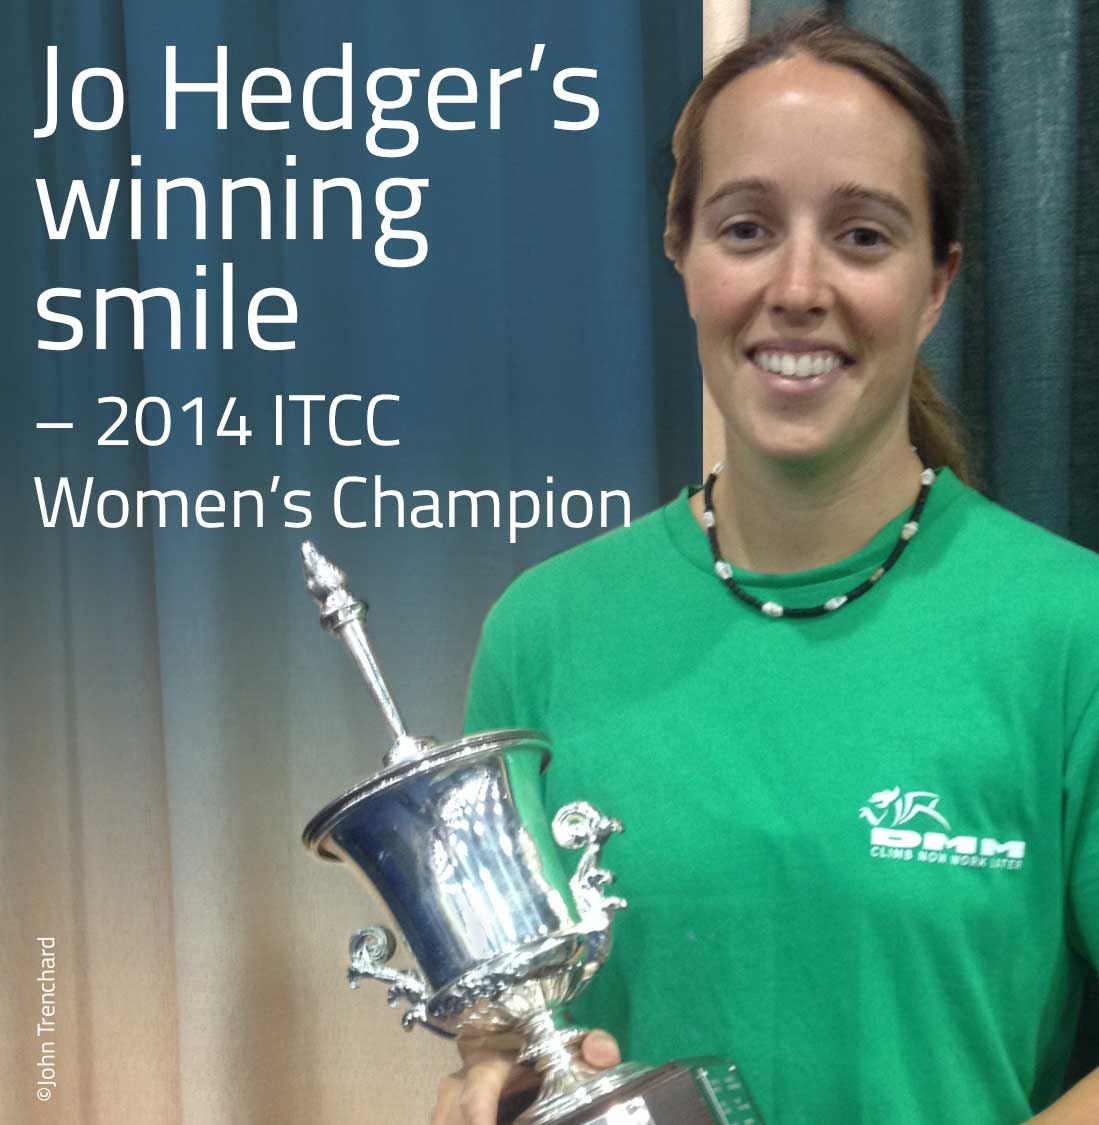 Jo Hedger's winning smile - 2014 ITCC Women's Champion. (John Trenchard)